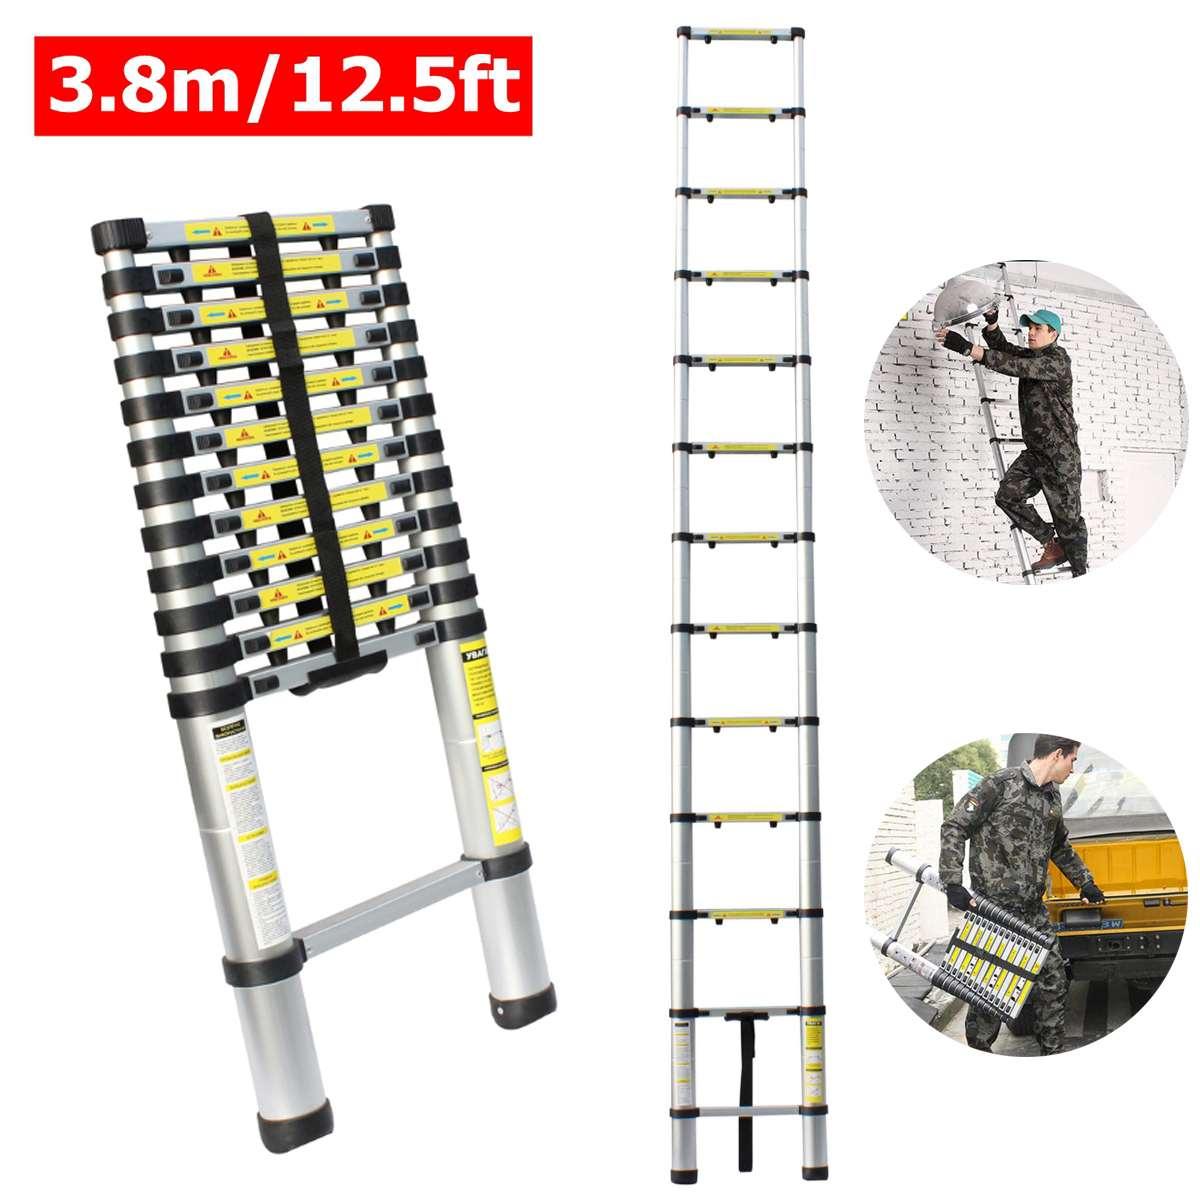 3.8m12.5ft Aluminum Multi-Purpose Extention Ladder Telescopic Stepladders Lightweight Portable Household Outdoor 330lbs